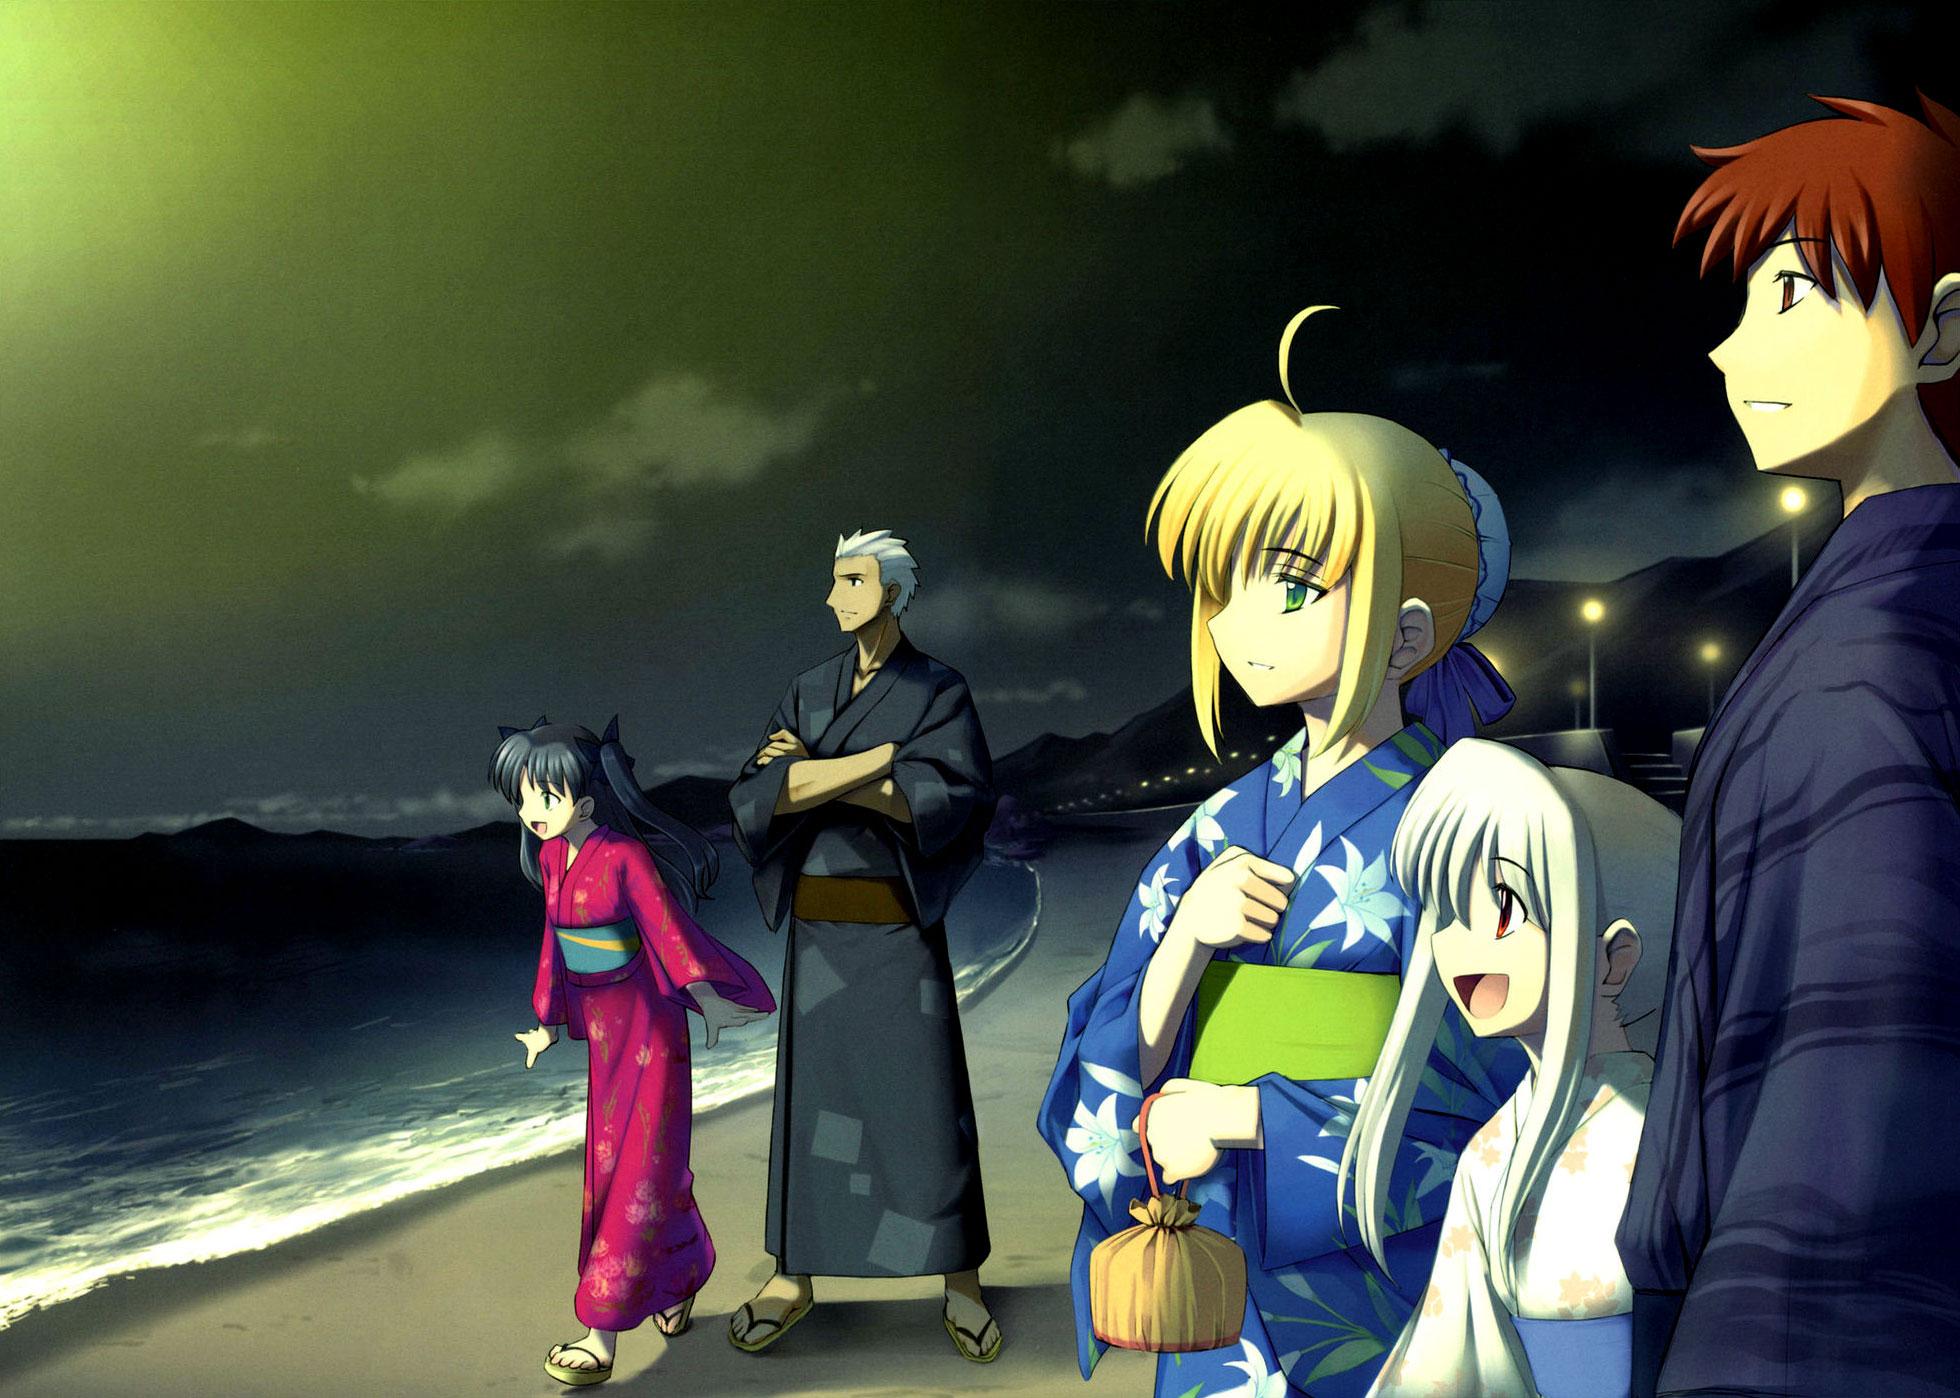 Fate Stay Night Beach Group Minitokyo